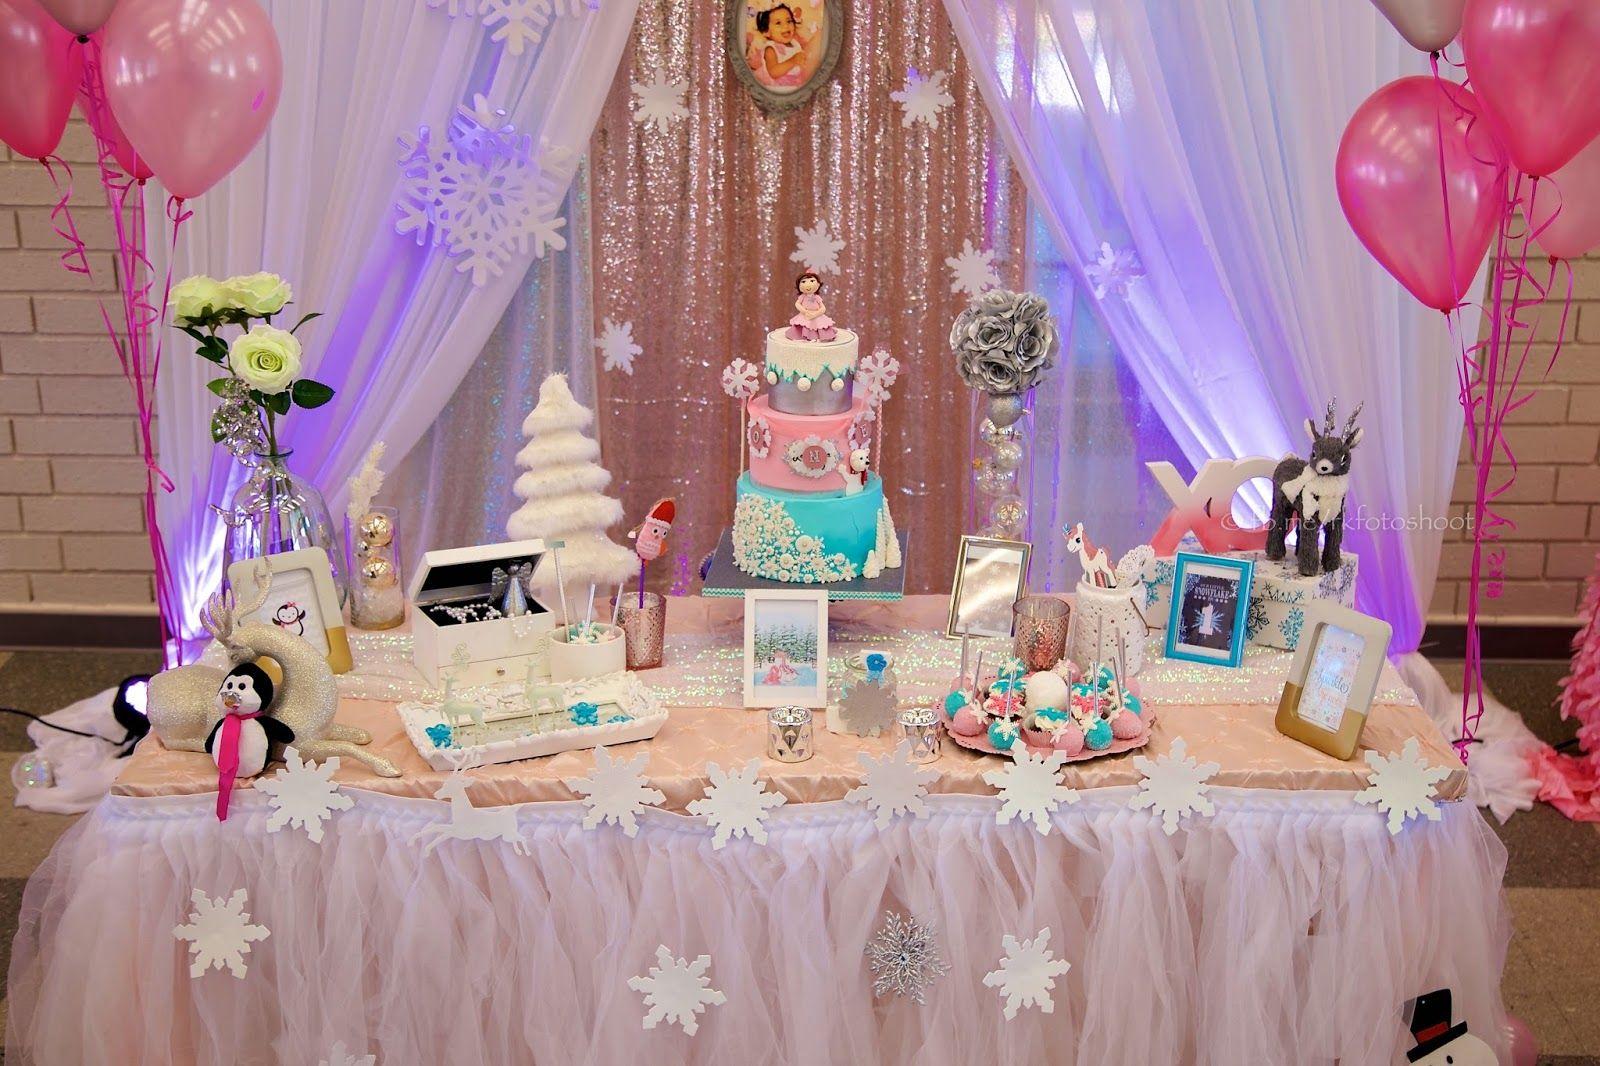 Wedding decorations using crepe paper october 2018 eningzevent   awhimsicalwinteronderlandbirthday